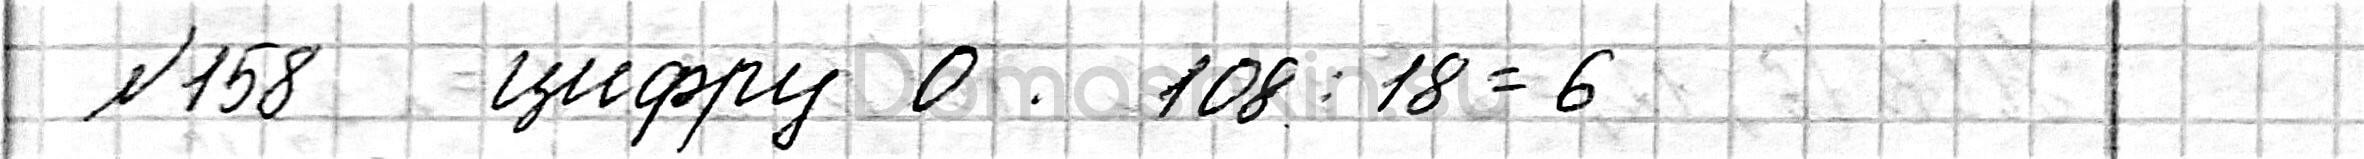 Математика 6 класс учебник Мерзляк номер 158 решение